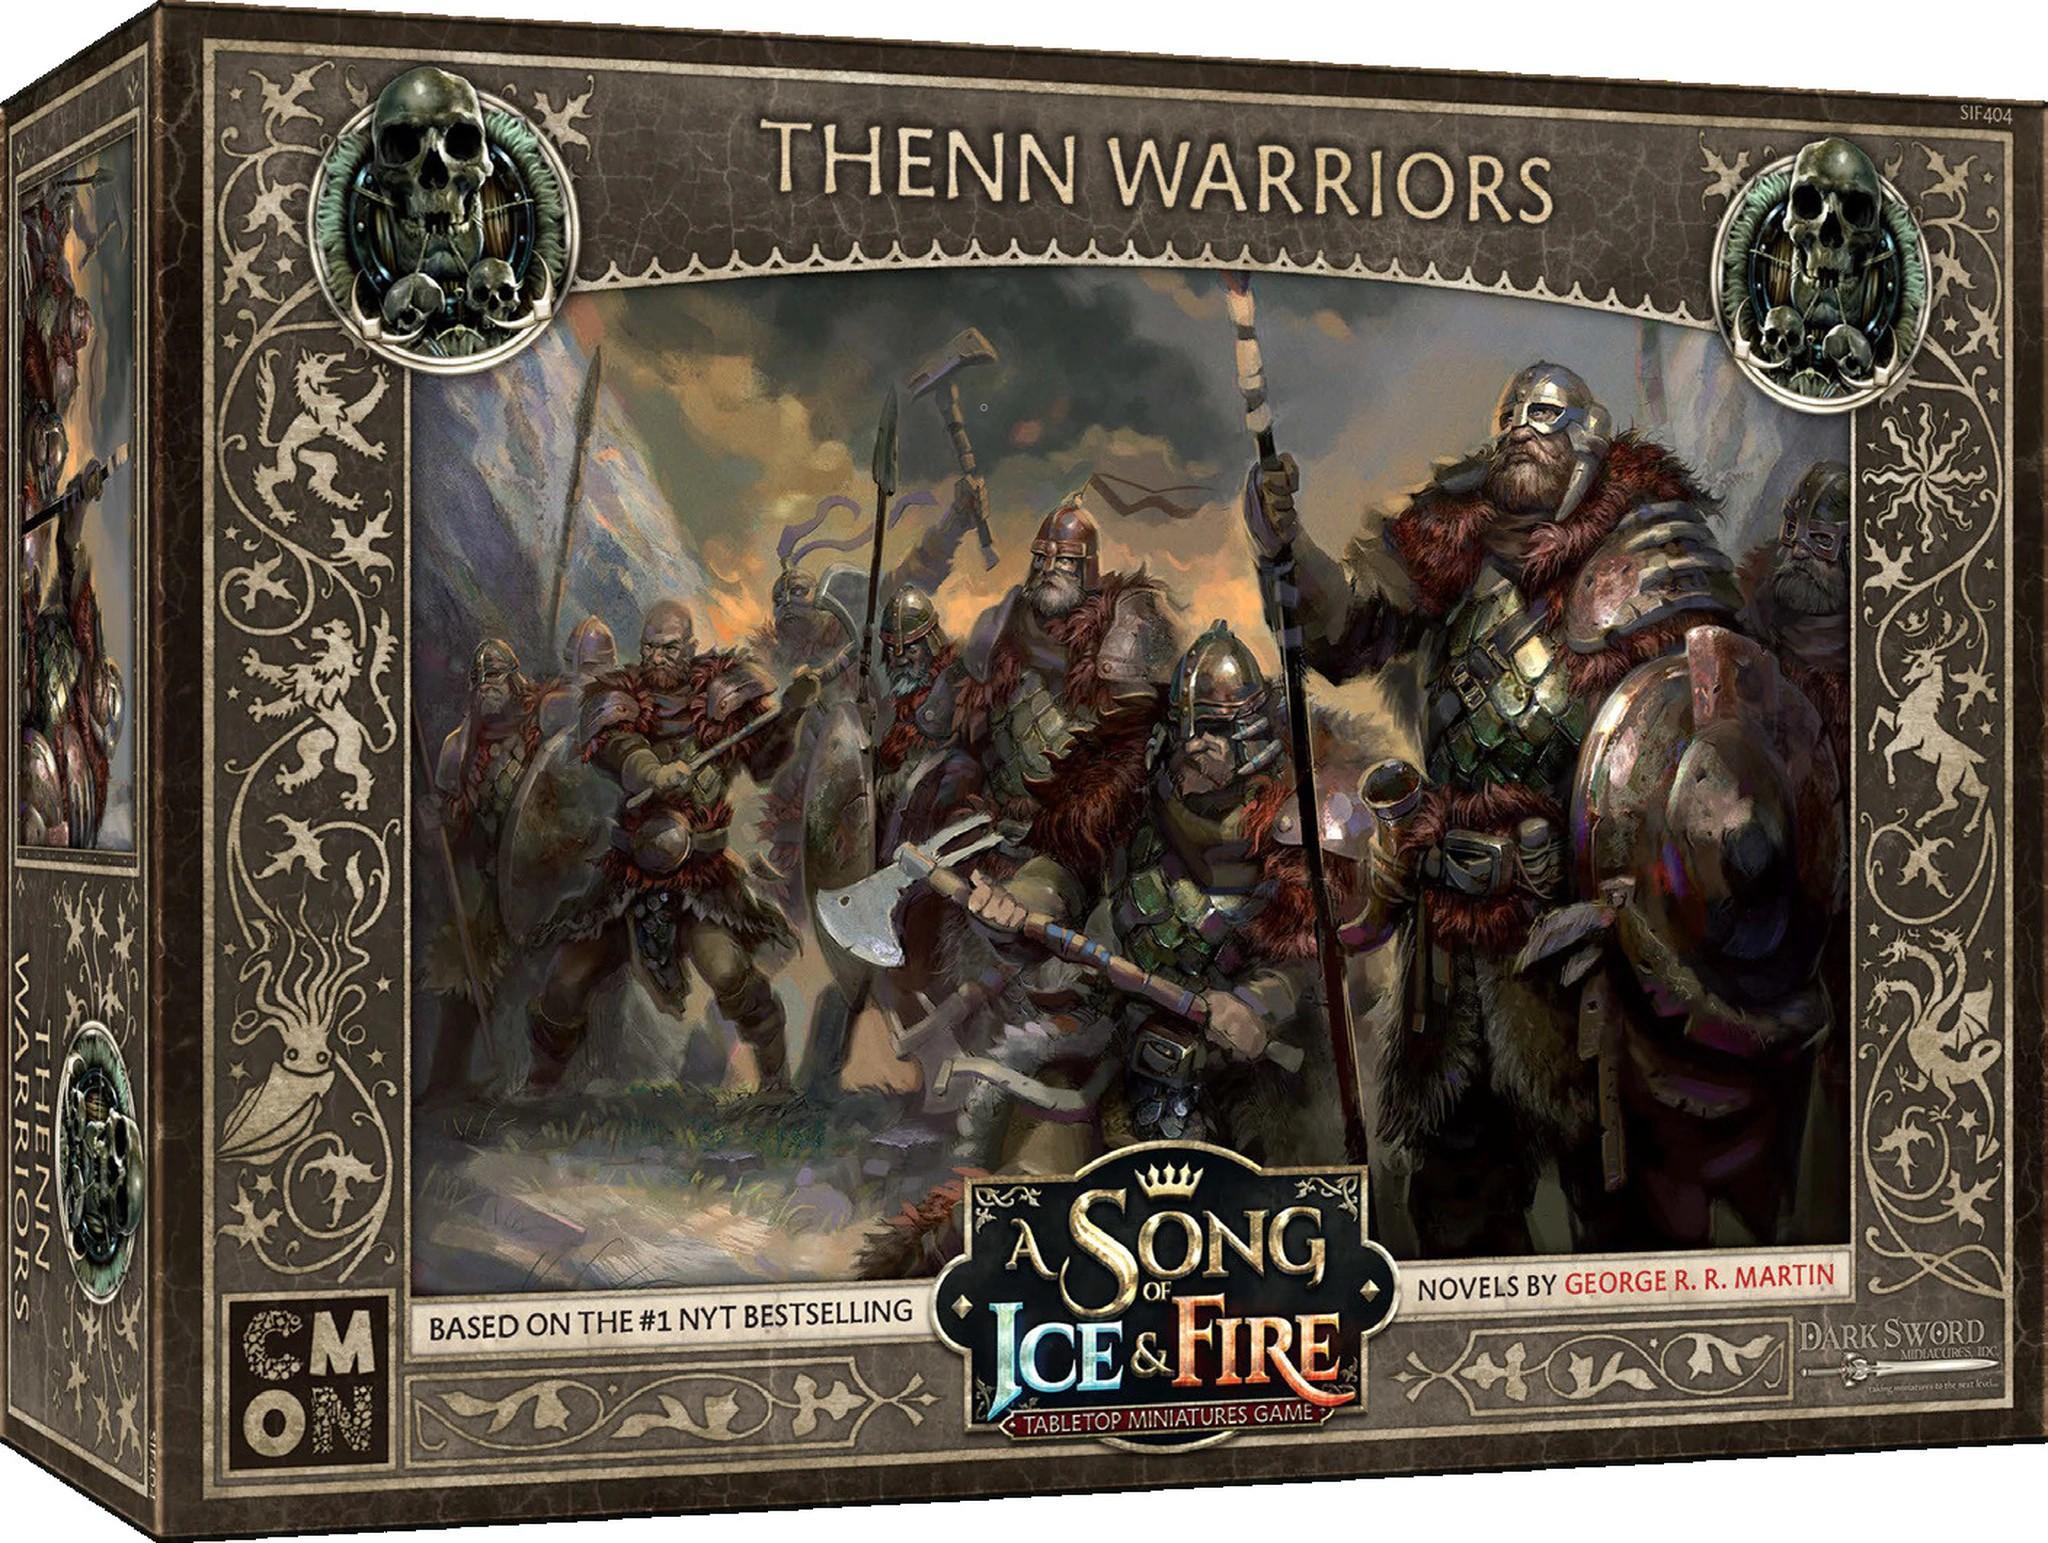 Thenn Warriors Boite de jeu US